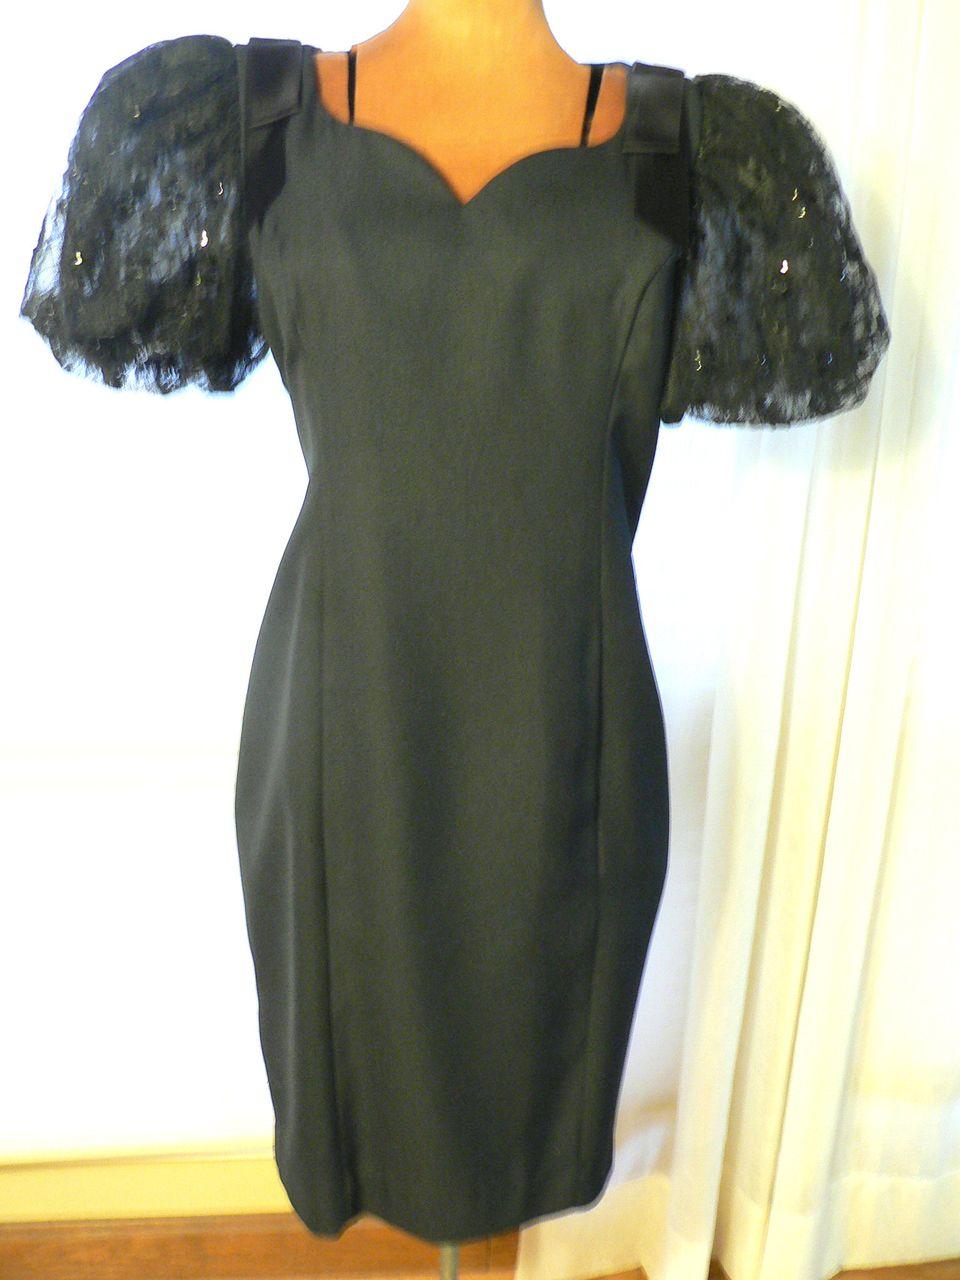 1980s Jessica Howard Sequin Sleeved Black Wiggle Cocktail Dress Sz 6